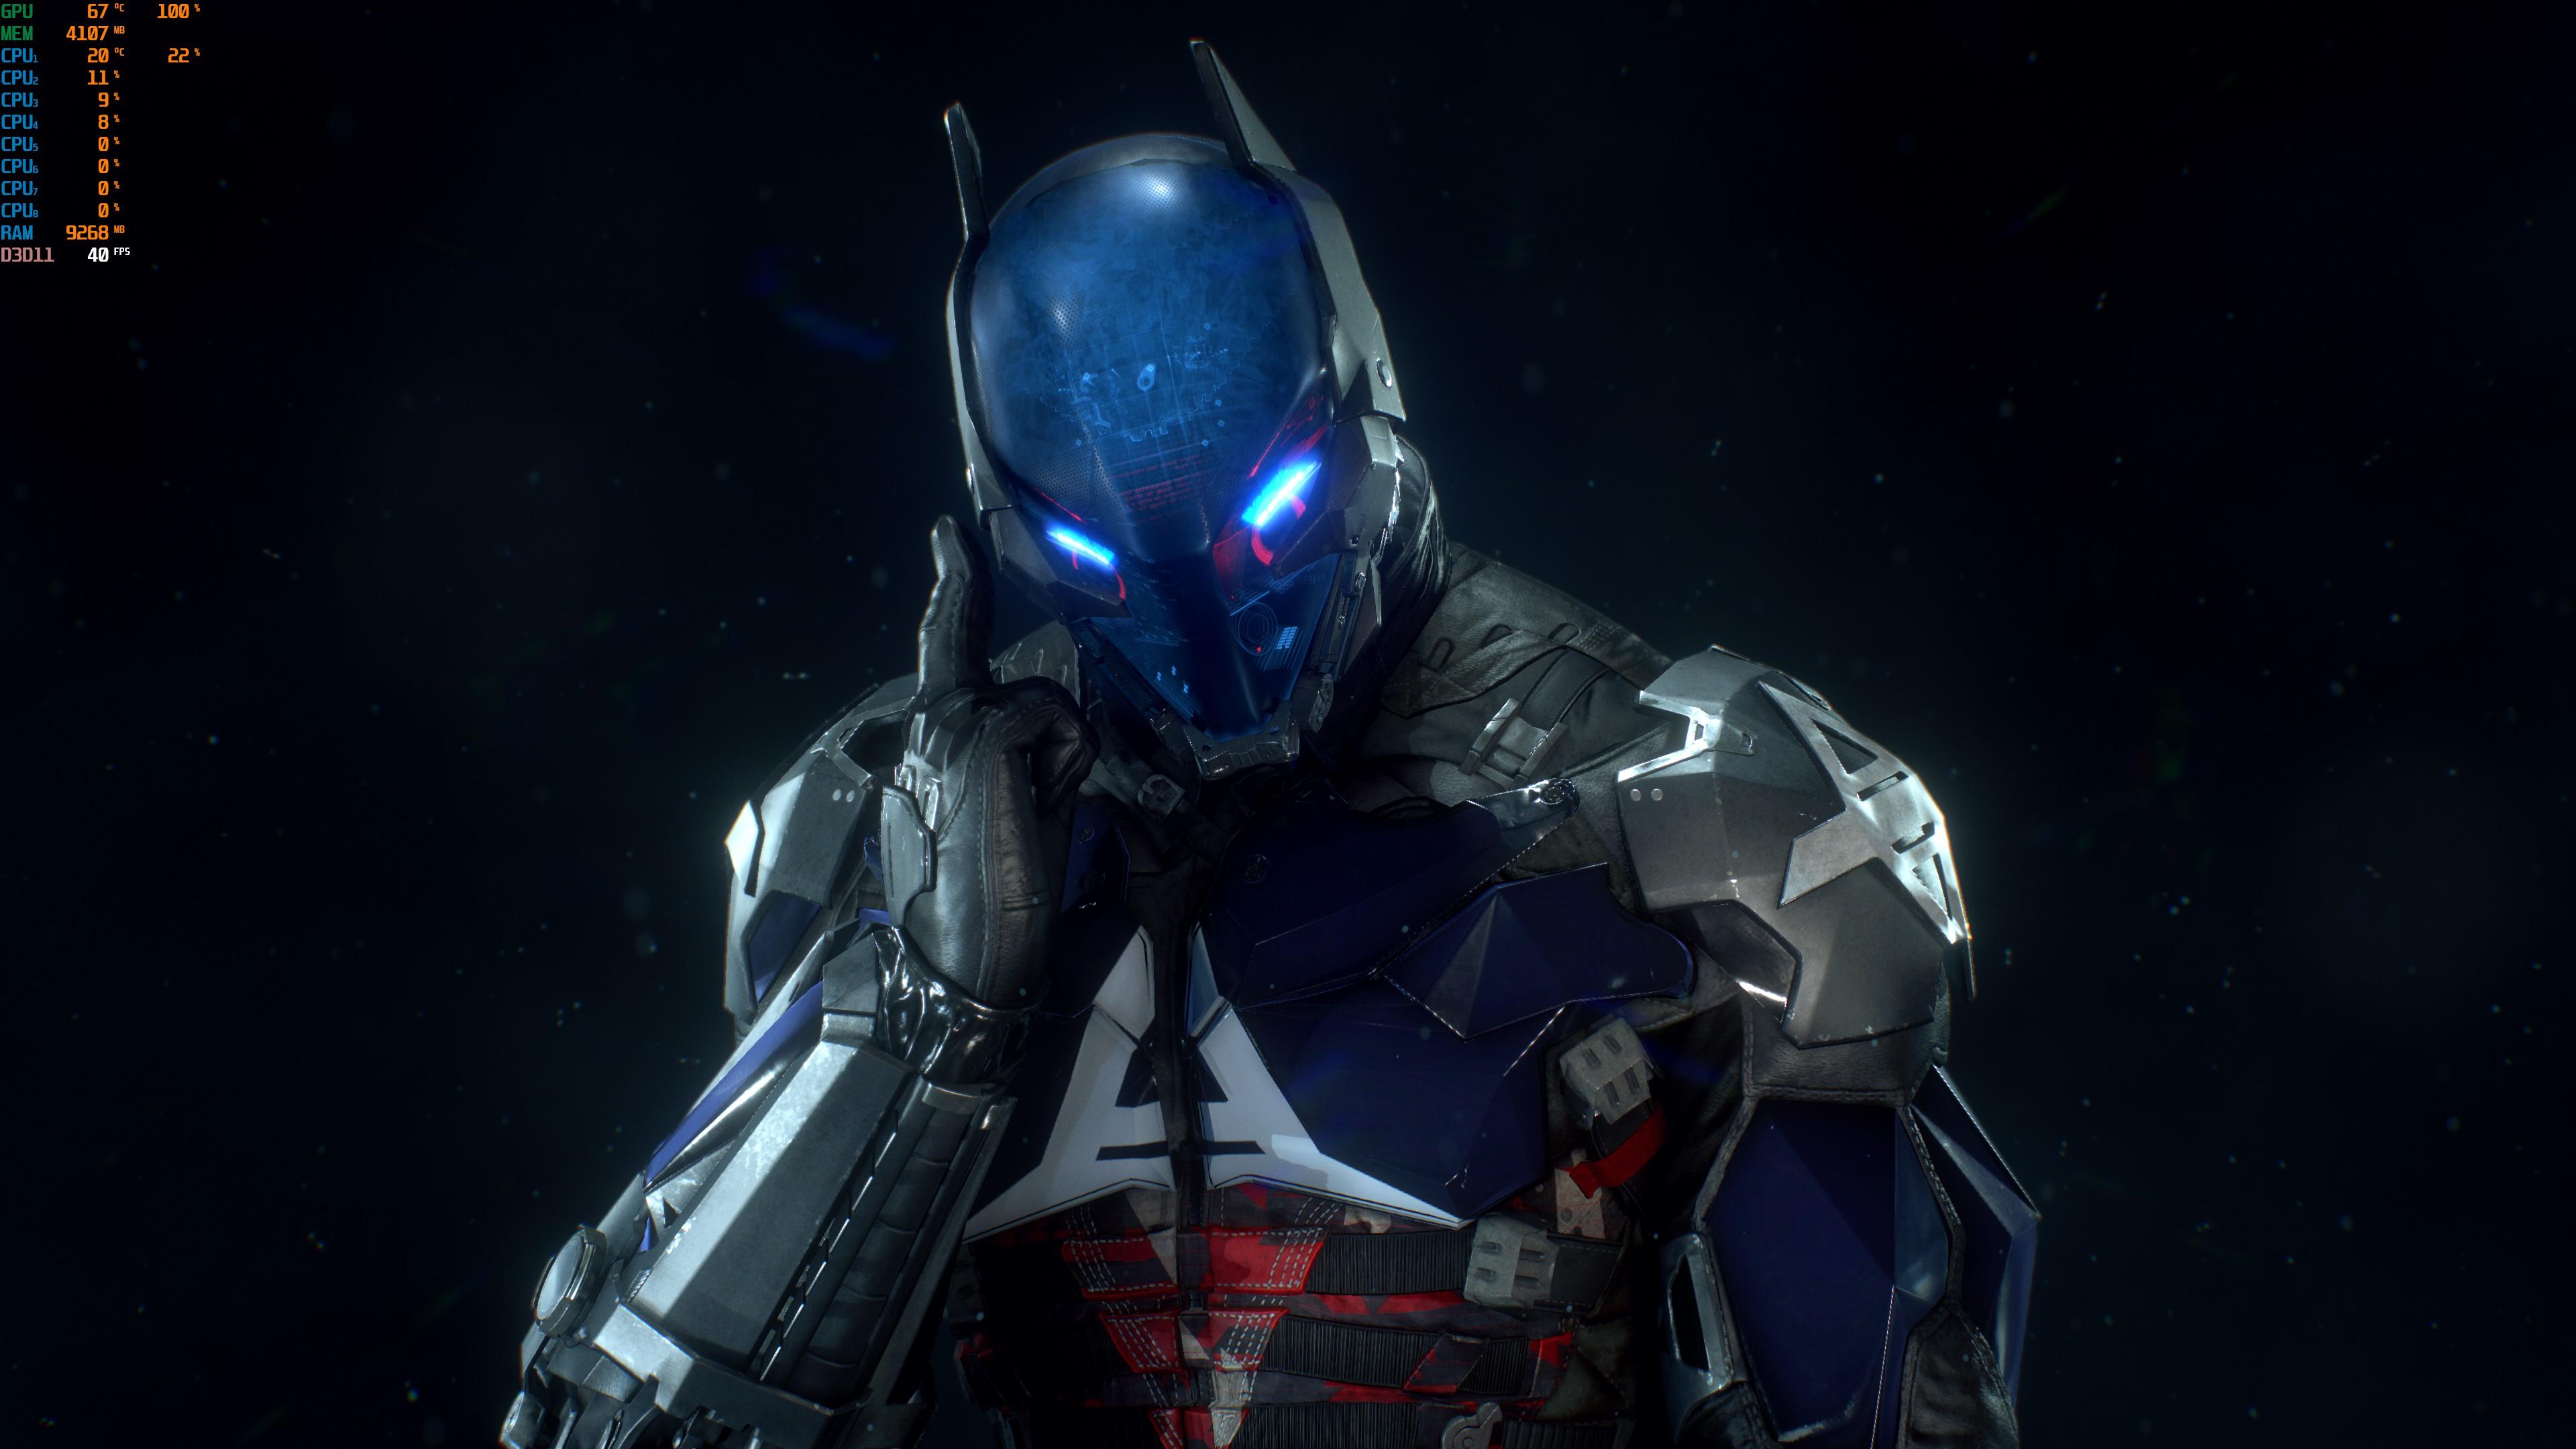 Arkham knight - Batman: Arkham Knight